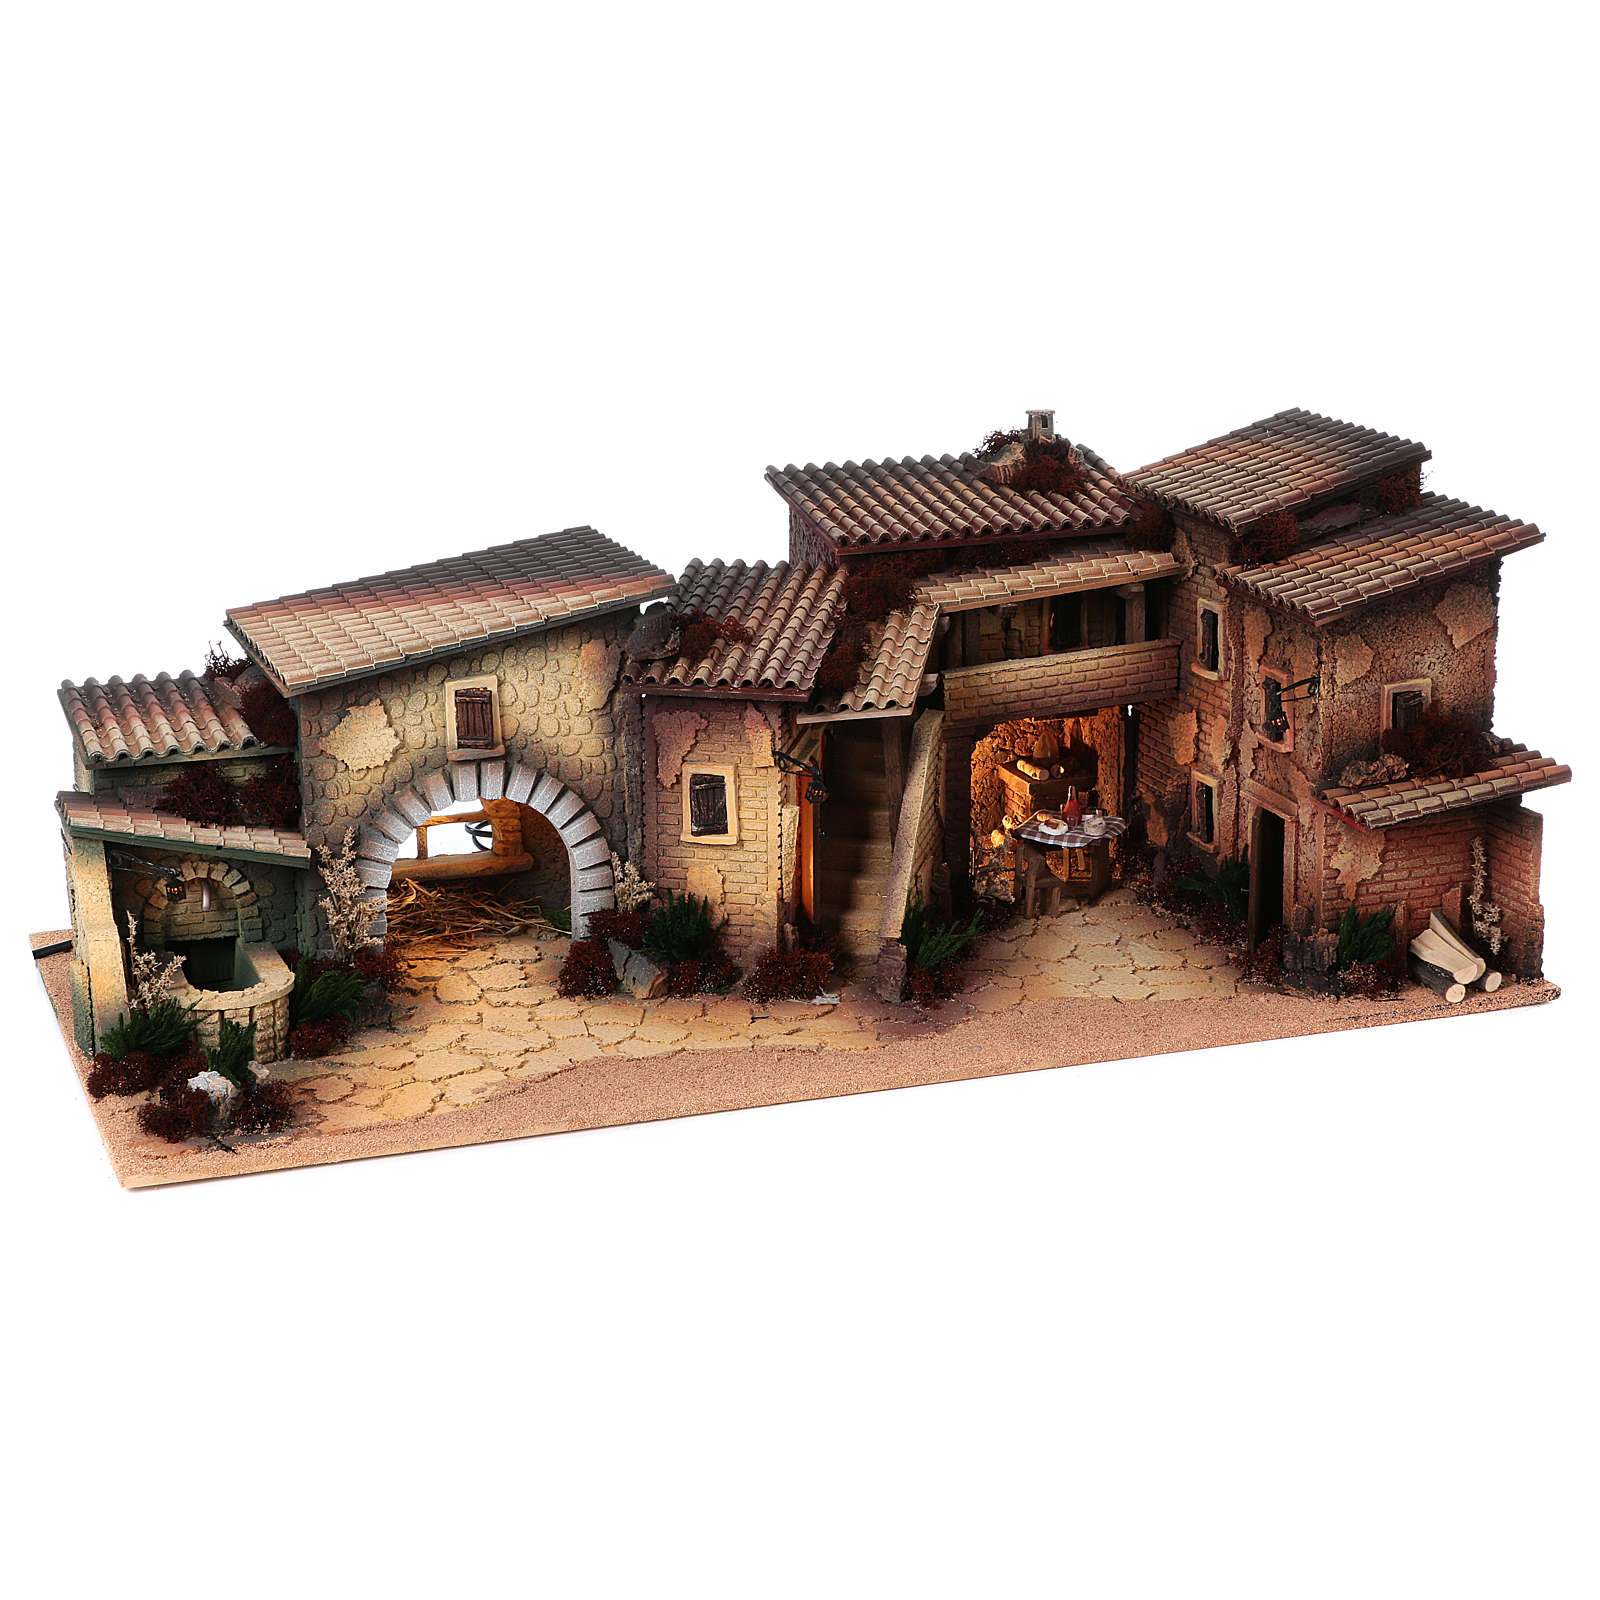 Borgo popolare presepiale 35x100x45 cm 4